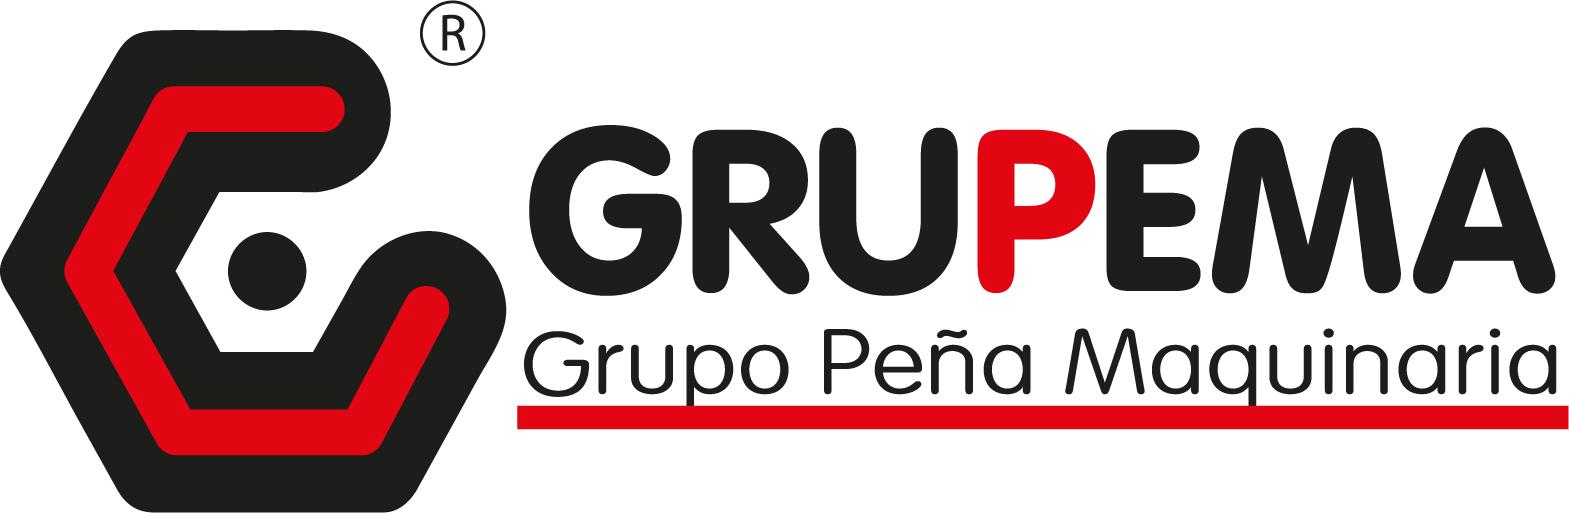 Grupema, Grupo Peña Maquinaria